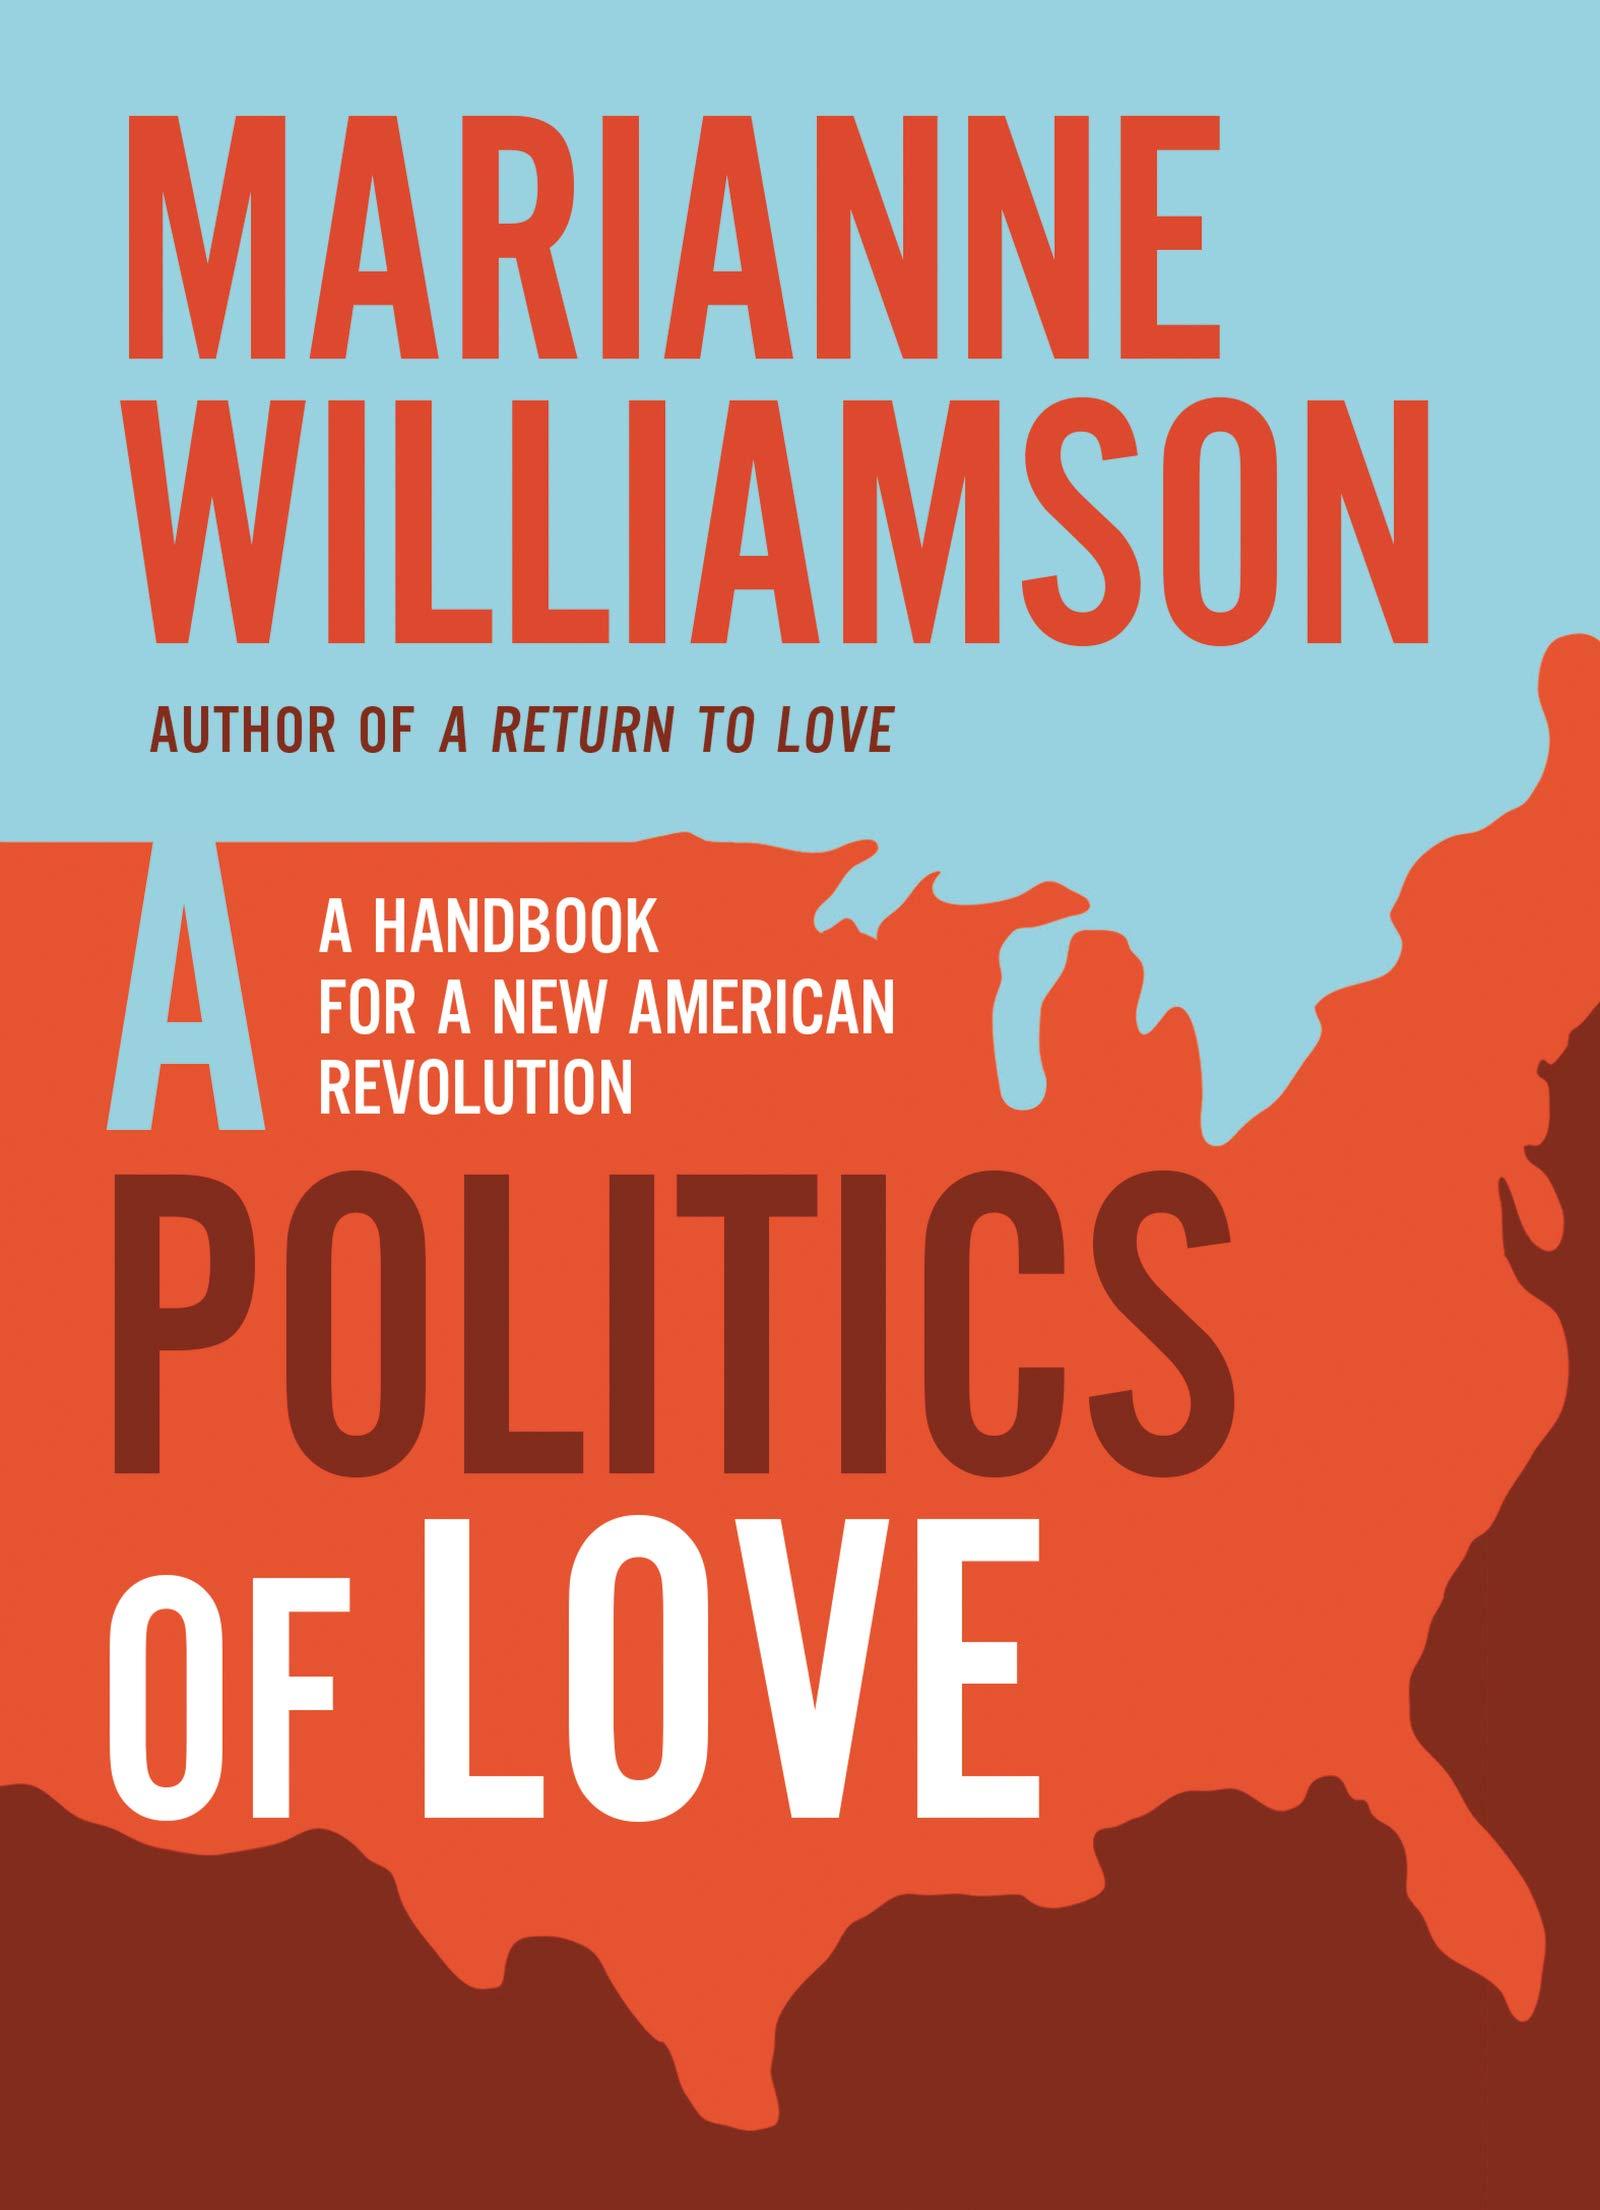 A Politics Of Love  A Handbook For A New American Revolution